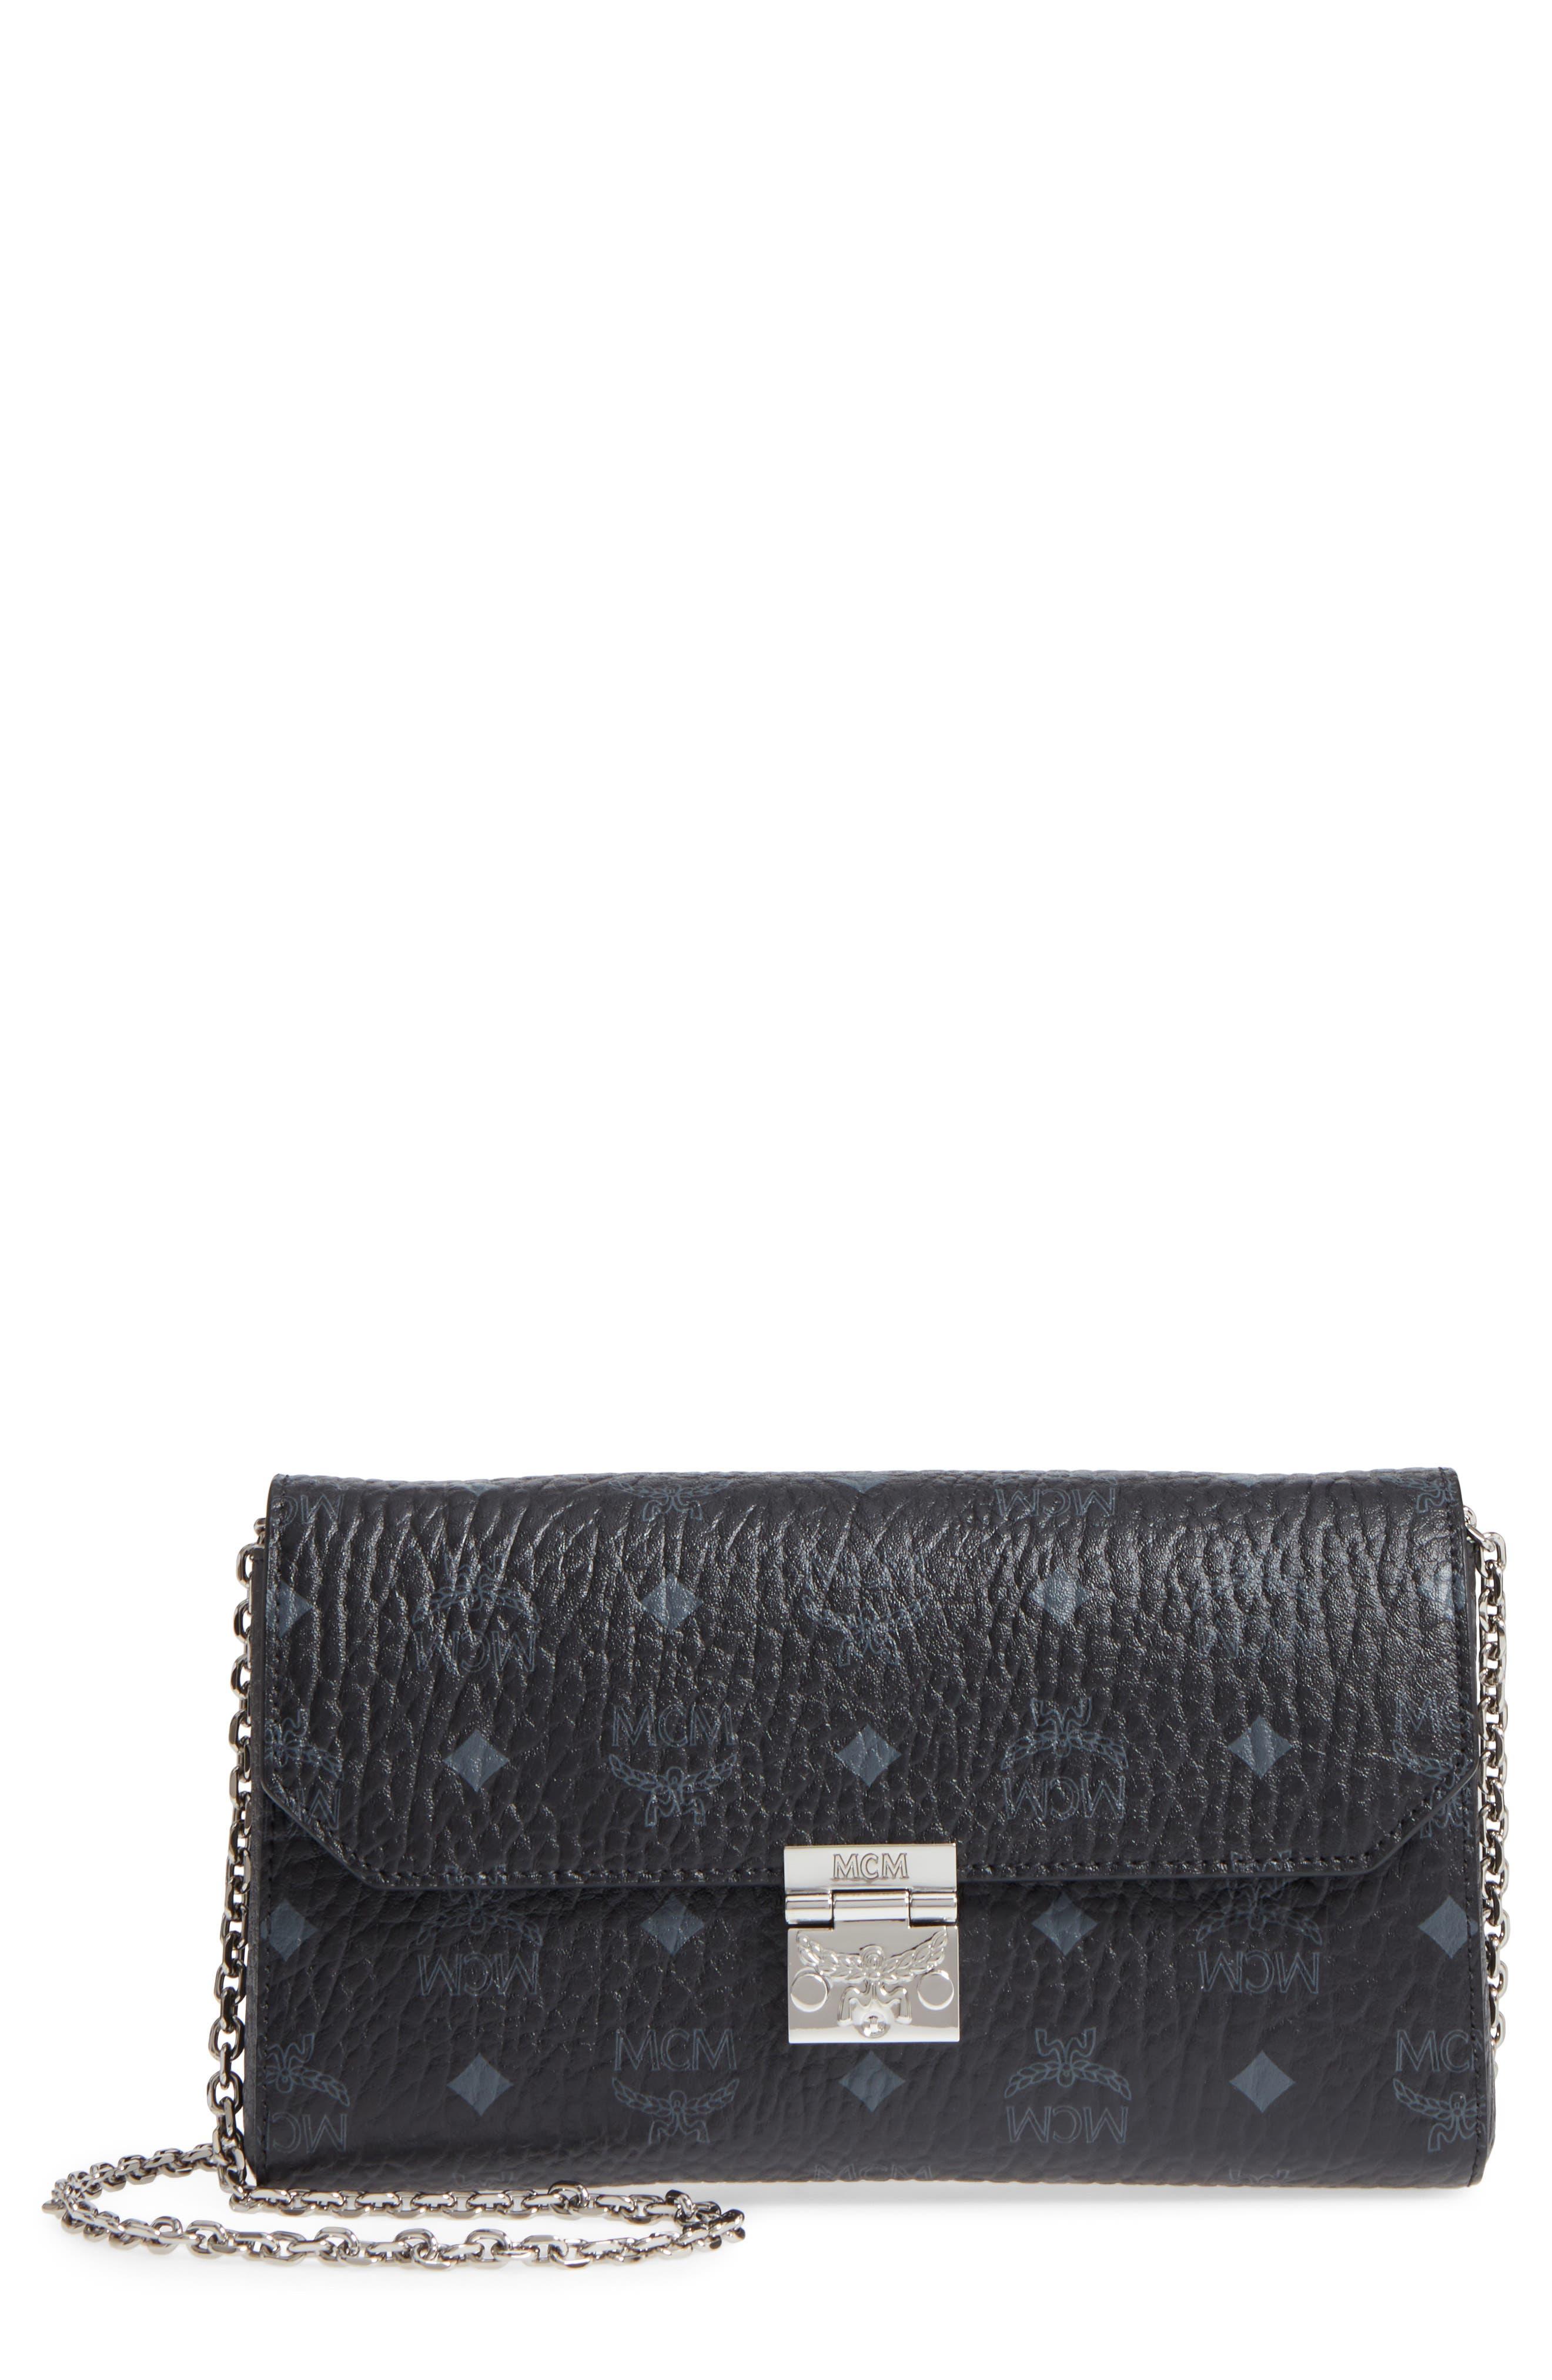 Mcm Crossbody bags Millie Monogrammed Leather Crossbody Bag